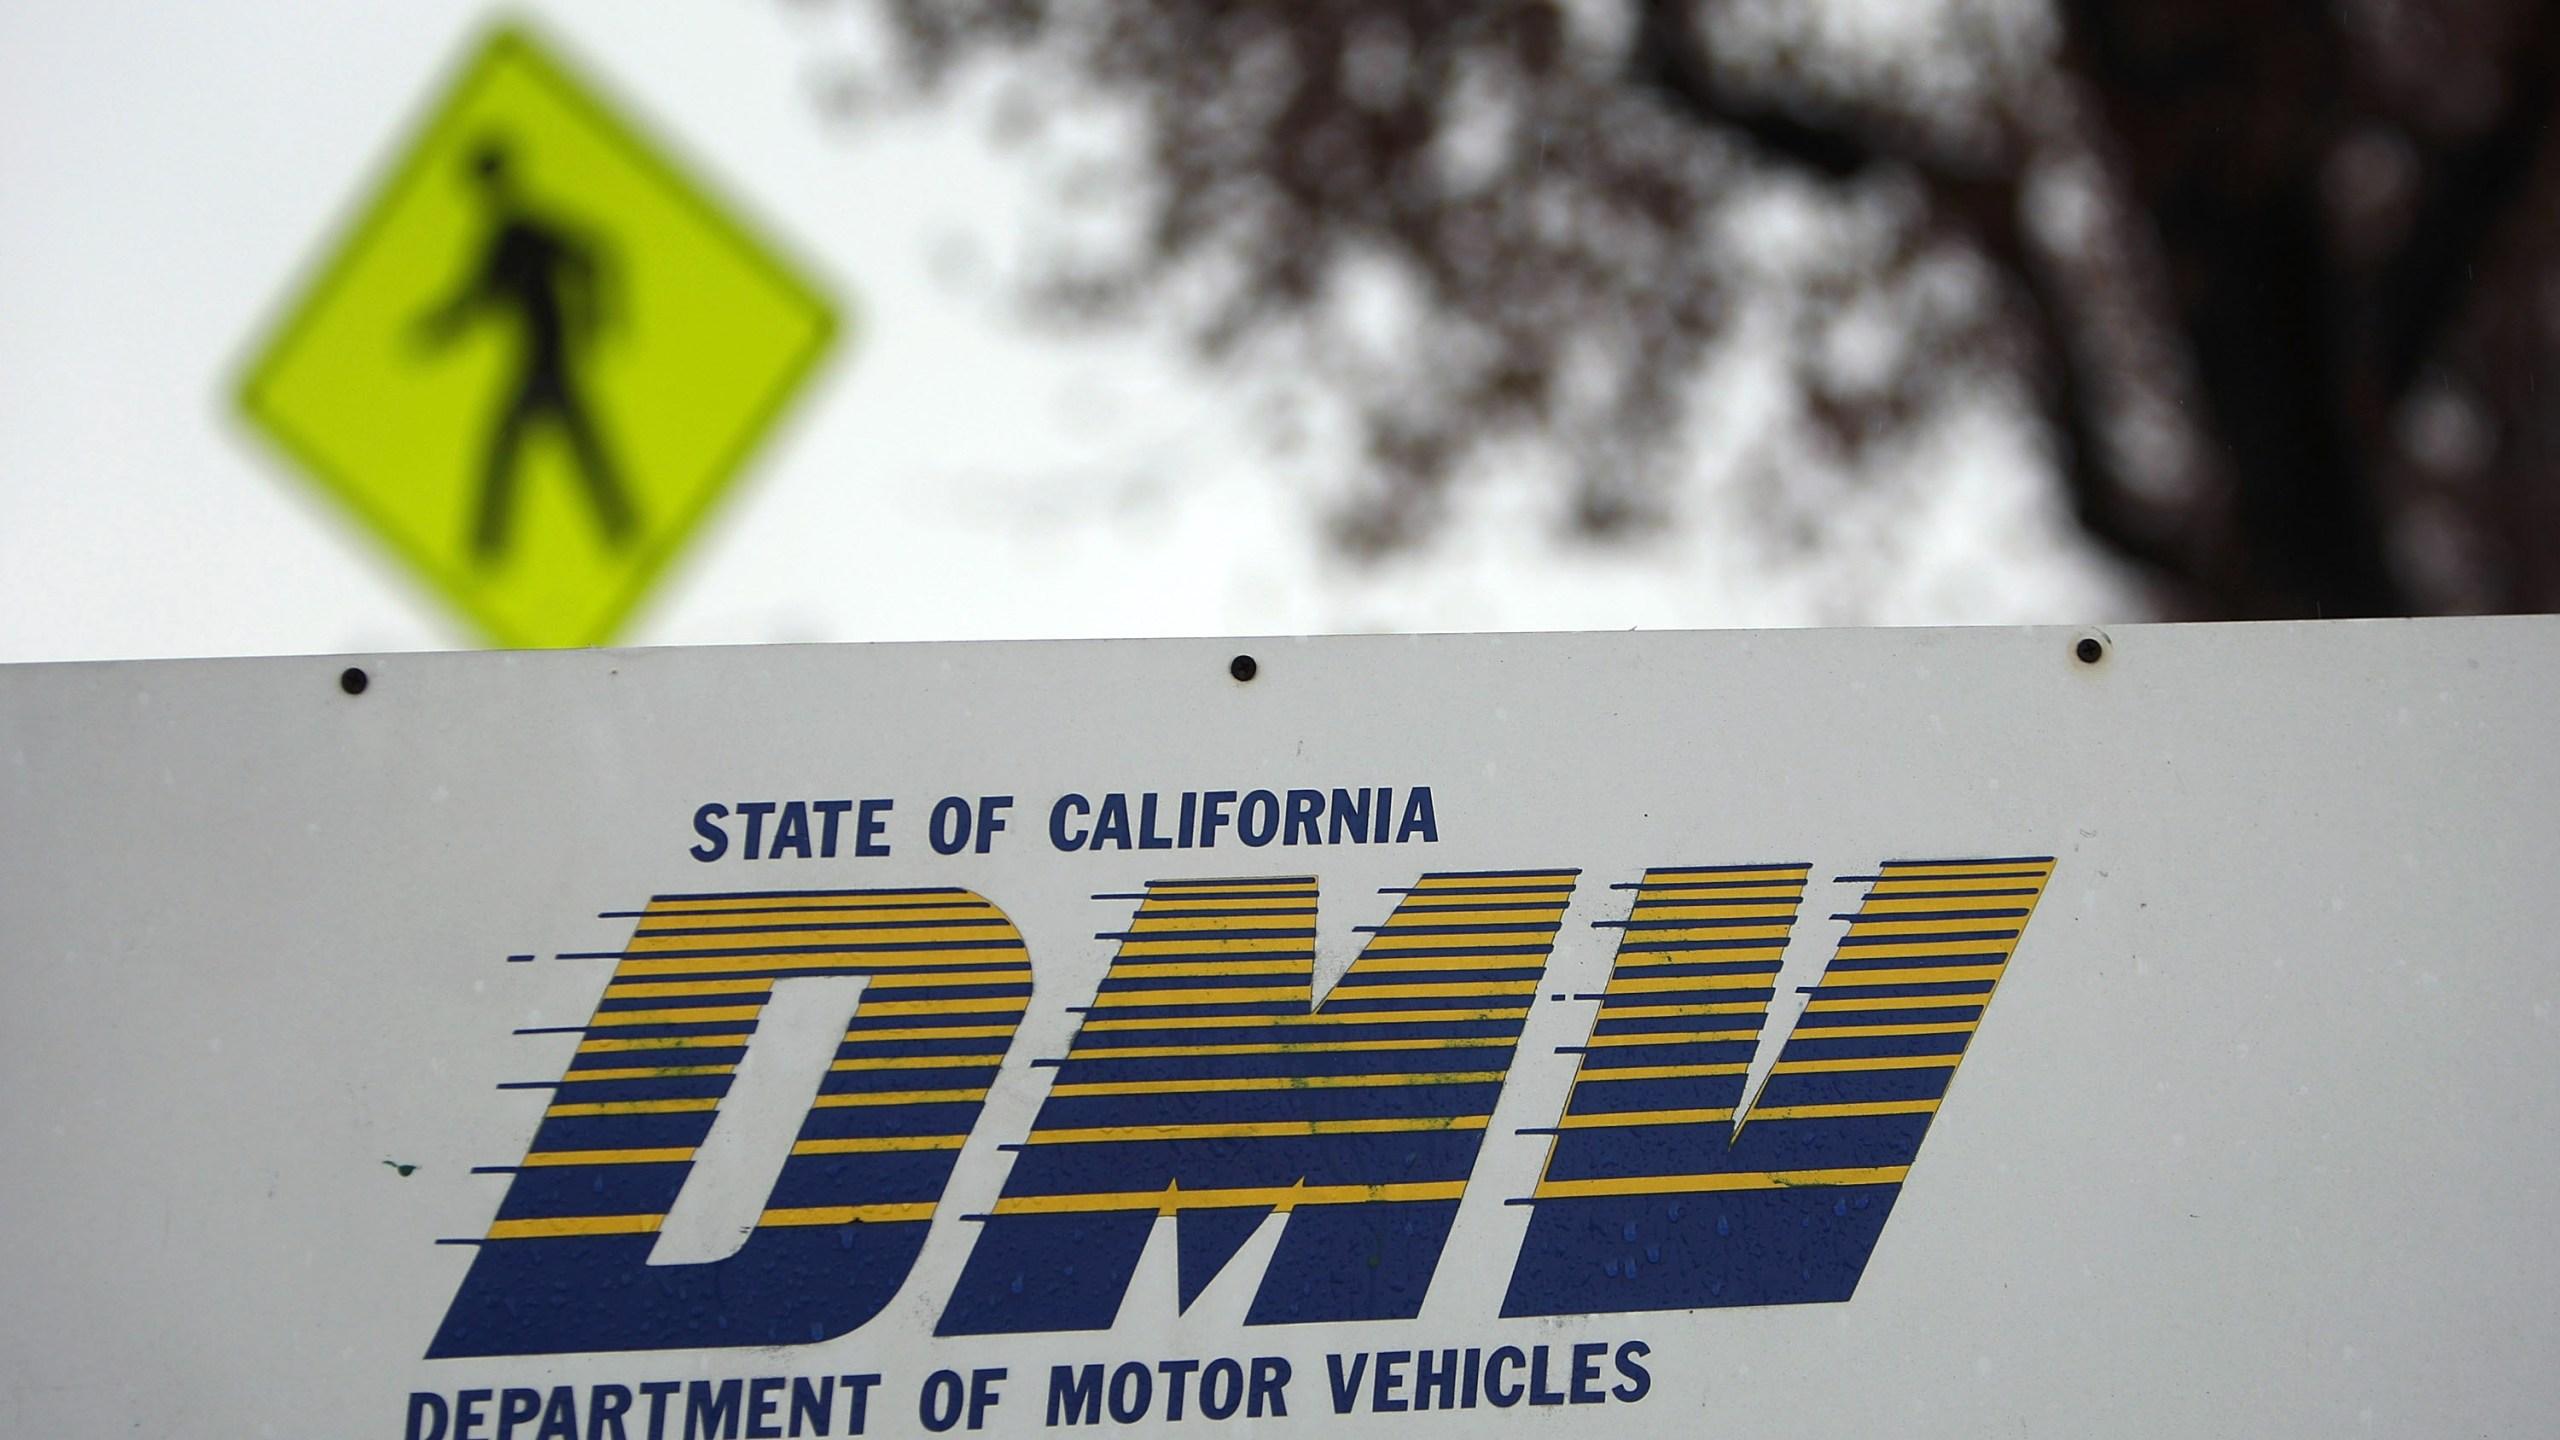 DMV Image